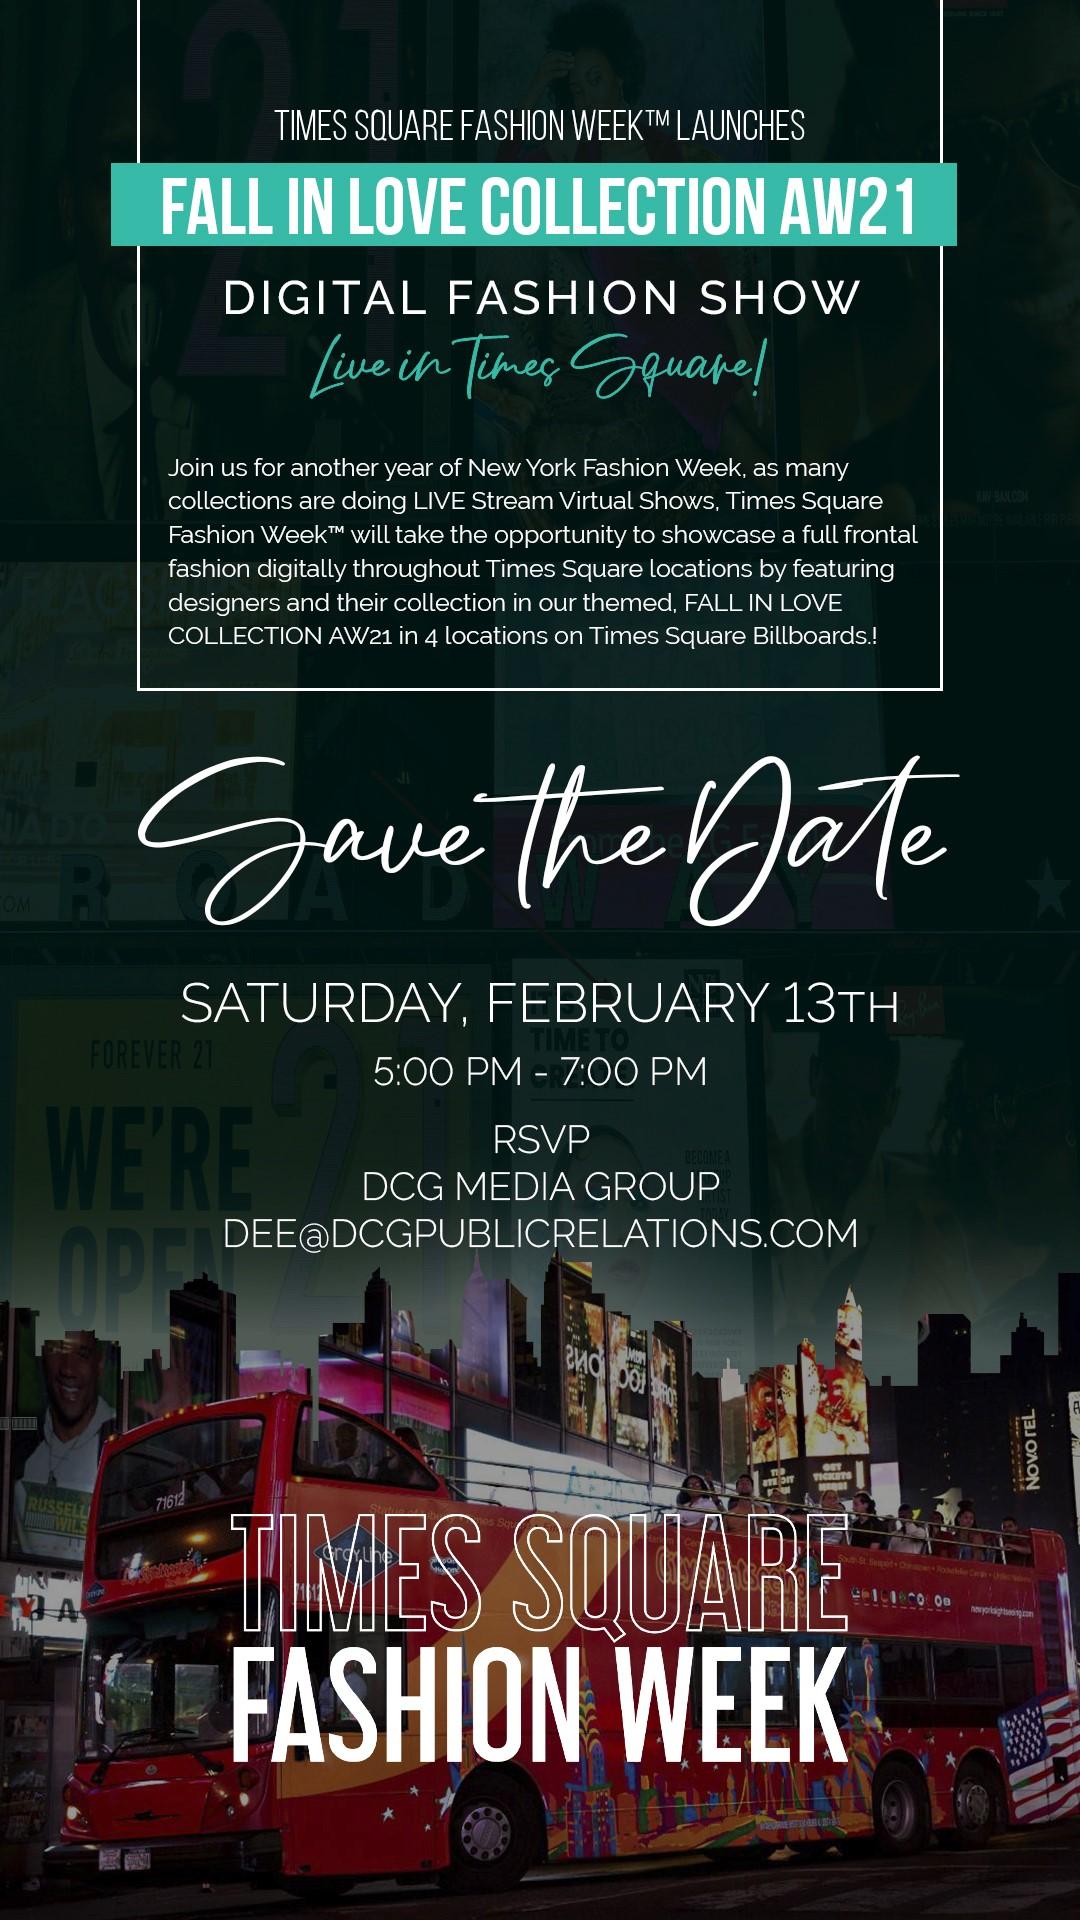 Lights! Camera! Times Square Fashion Week kicks off a Digital Fashion Experience on a NYC Double Decker Bus!